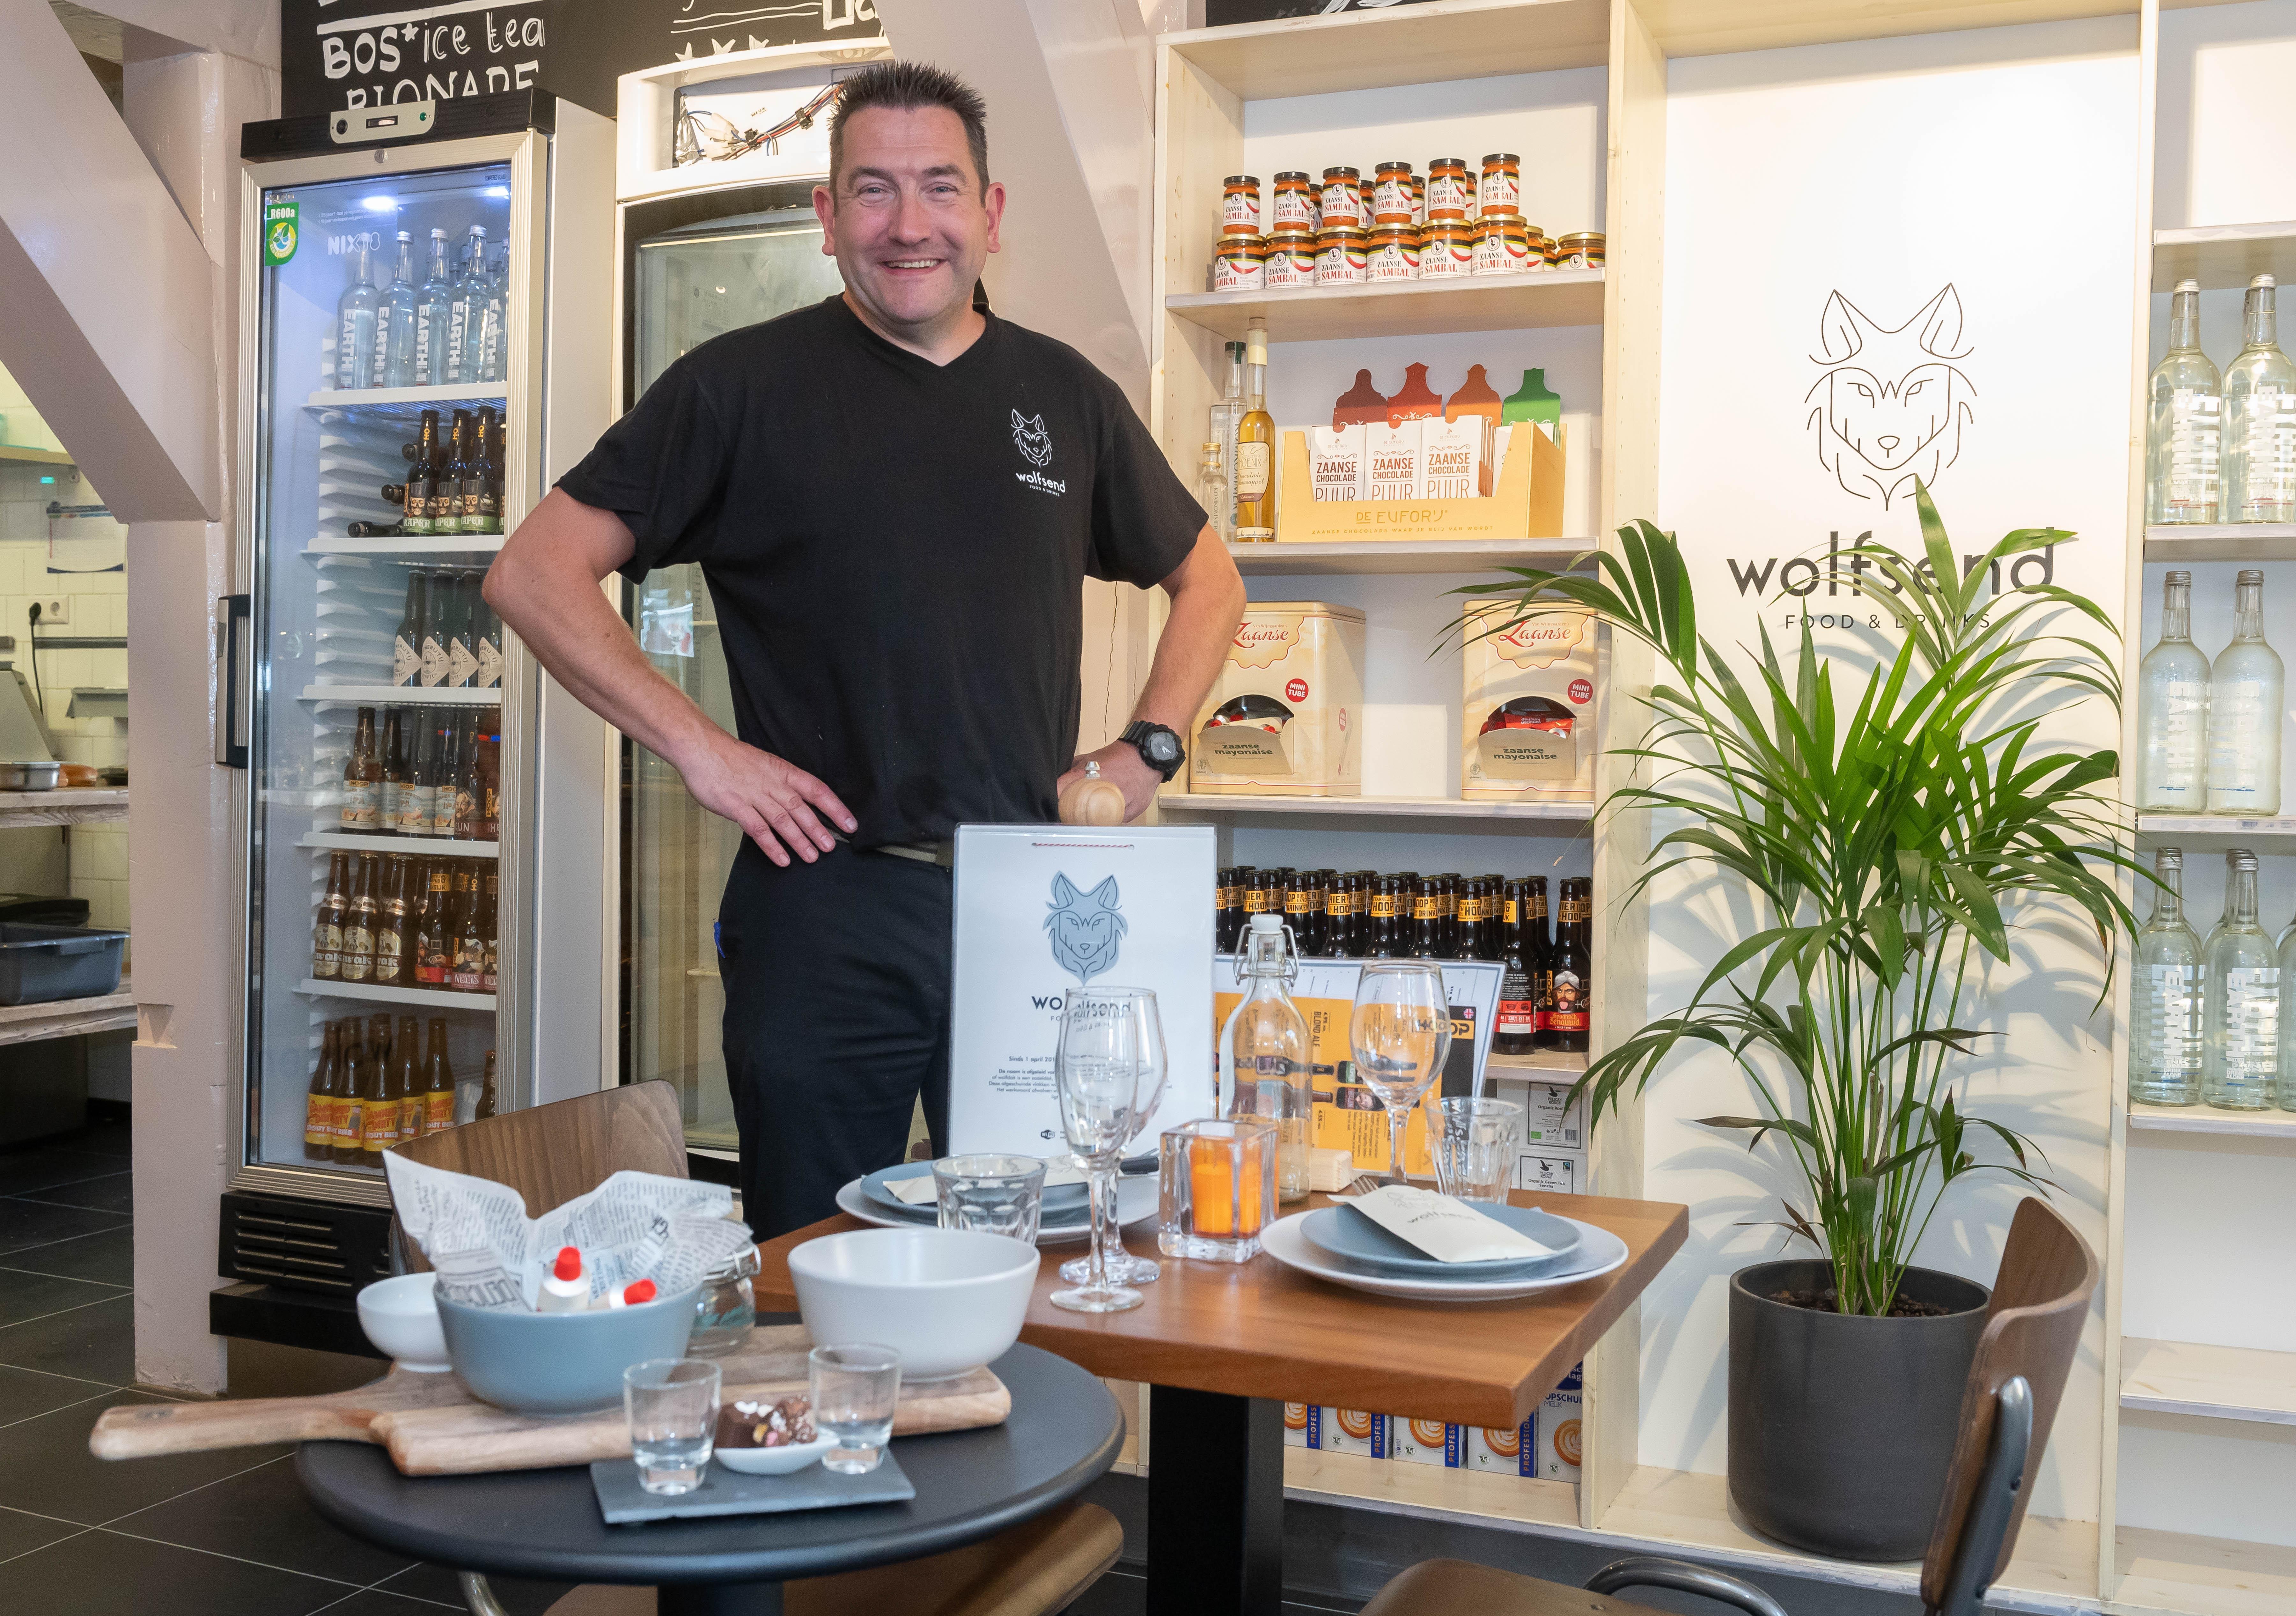 Jeroen Gruijs gooit het roer om: dág toeristen, hallo Zaankanters; 'toeristenzaak' Wolfsend wordt trendy eetcafé